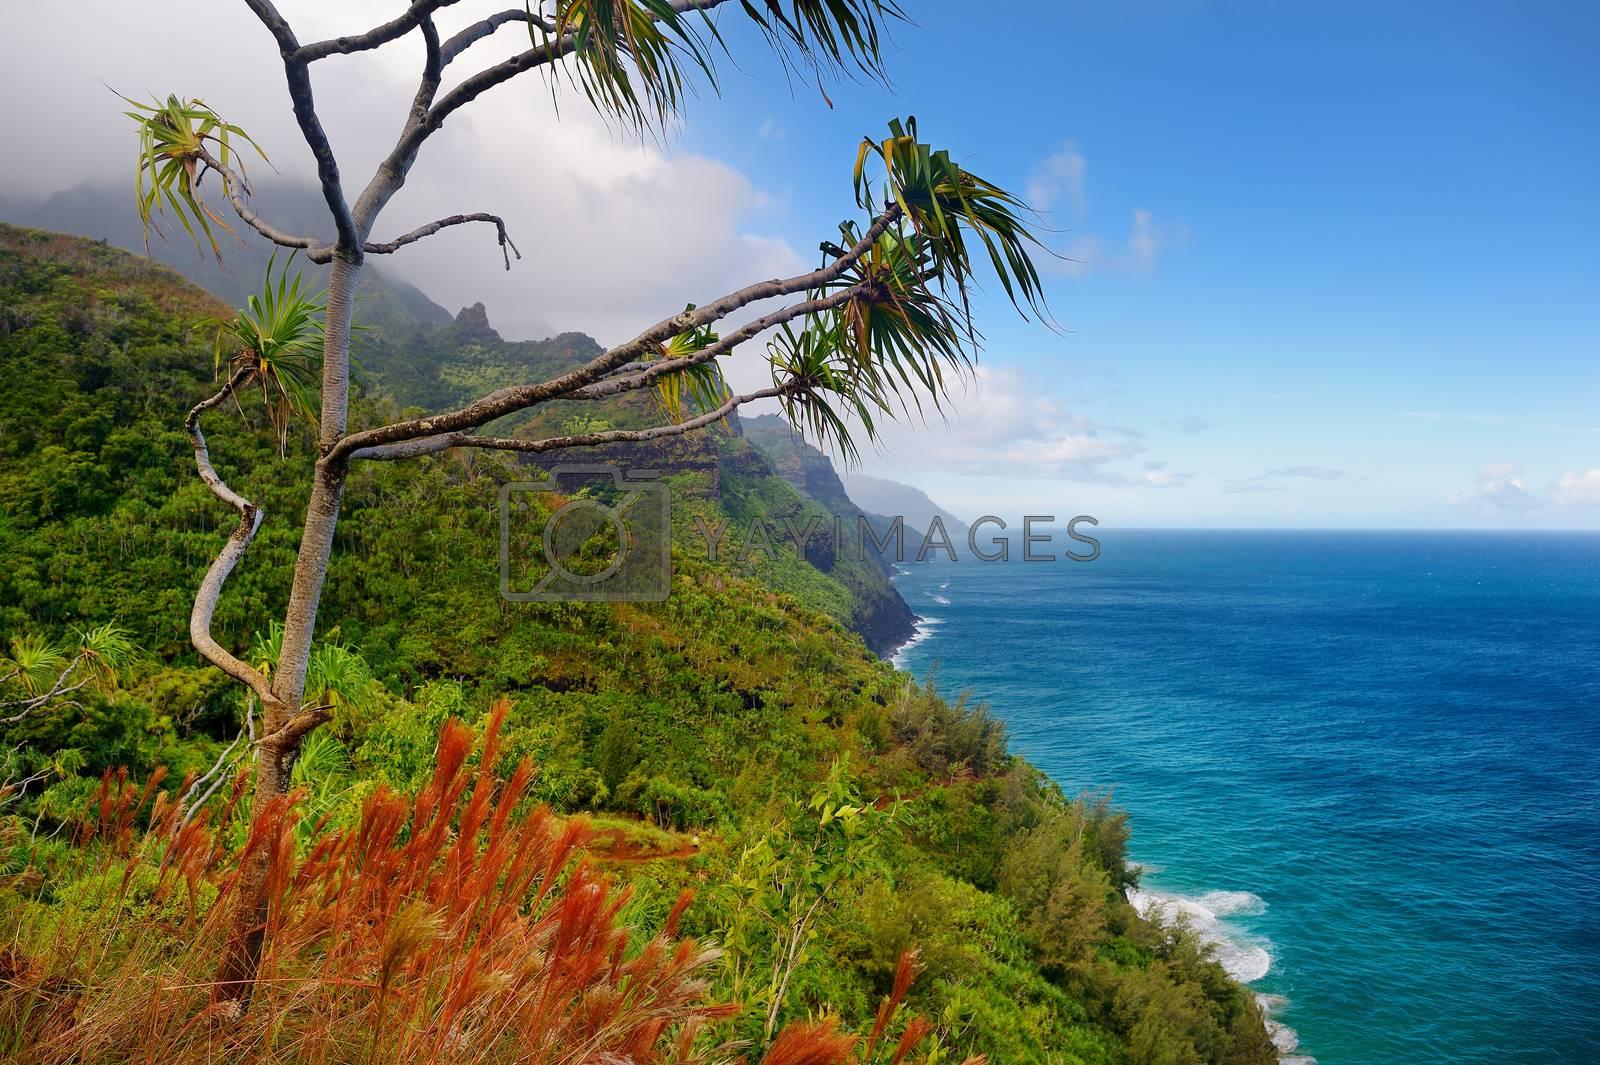 Royalty free image of Kalalau trail in Kauai, Hawaii by maximkabb